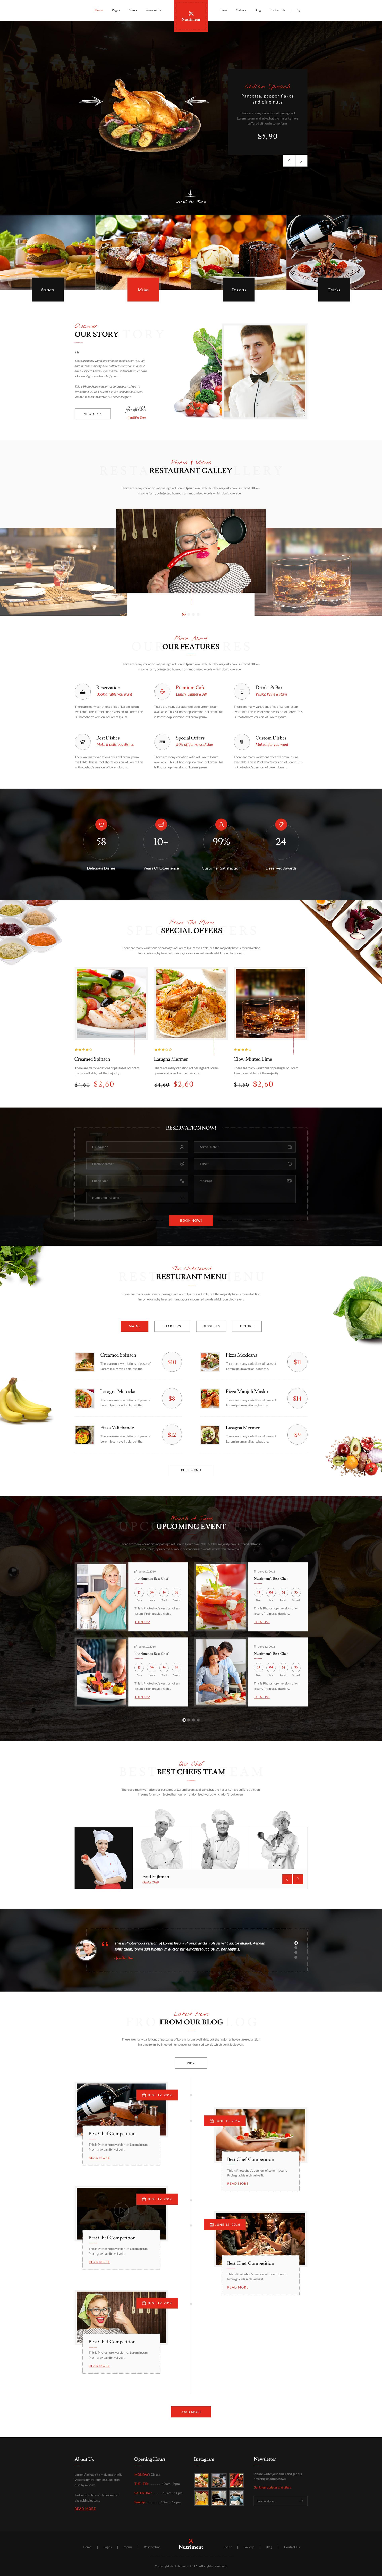 Strot Portfolio HTML5 Template